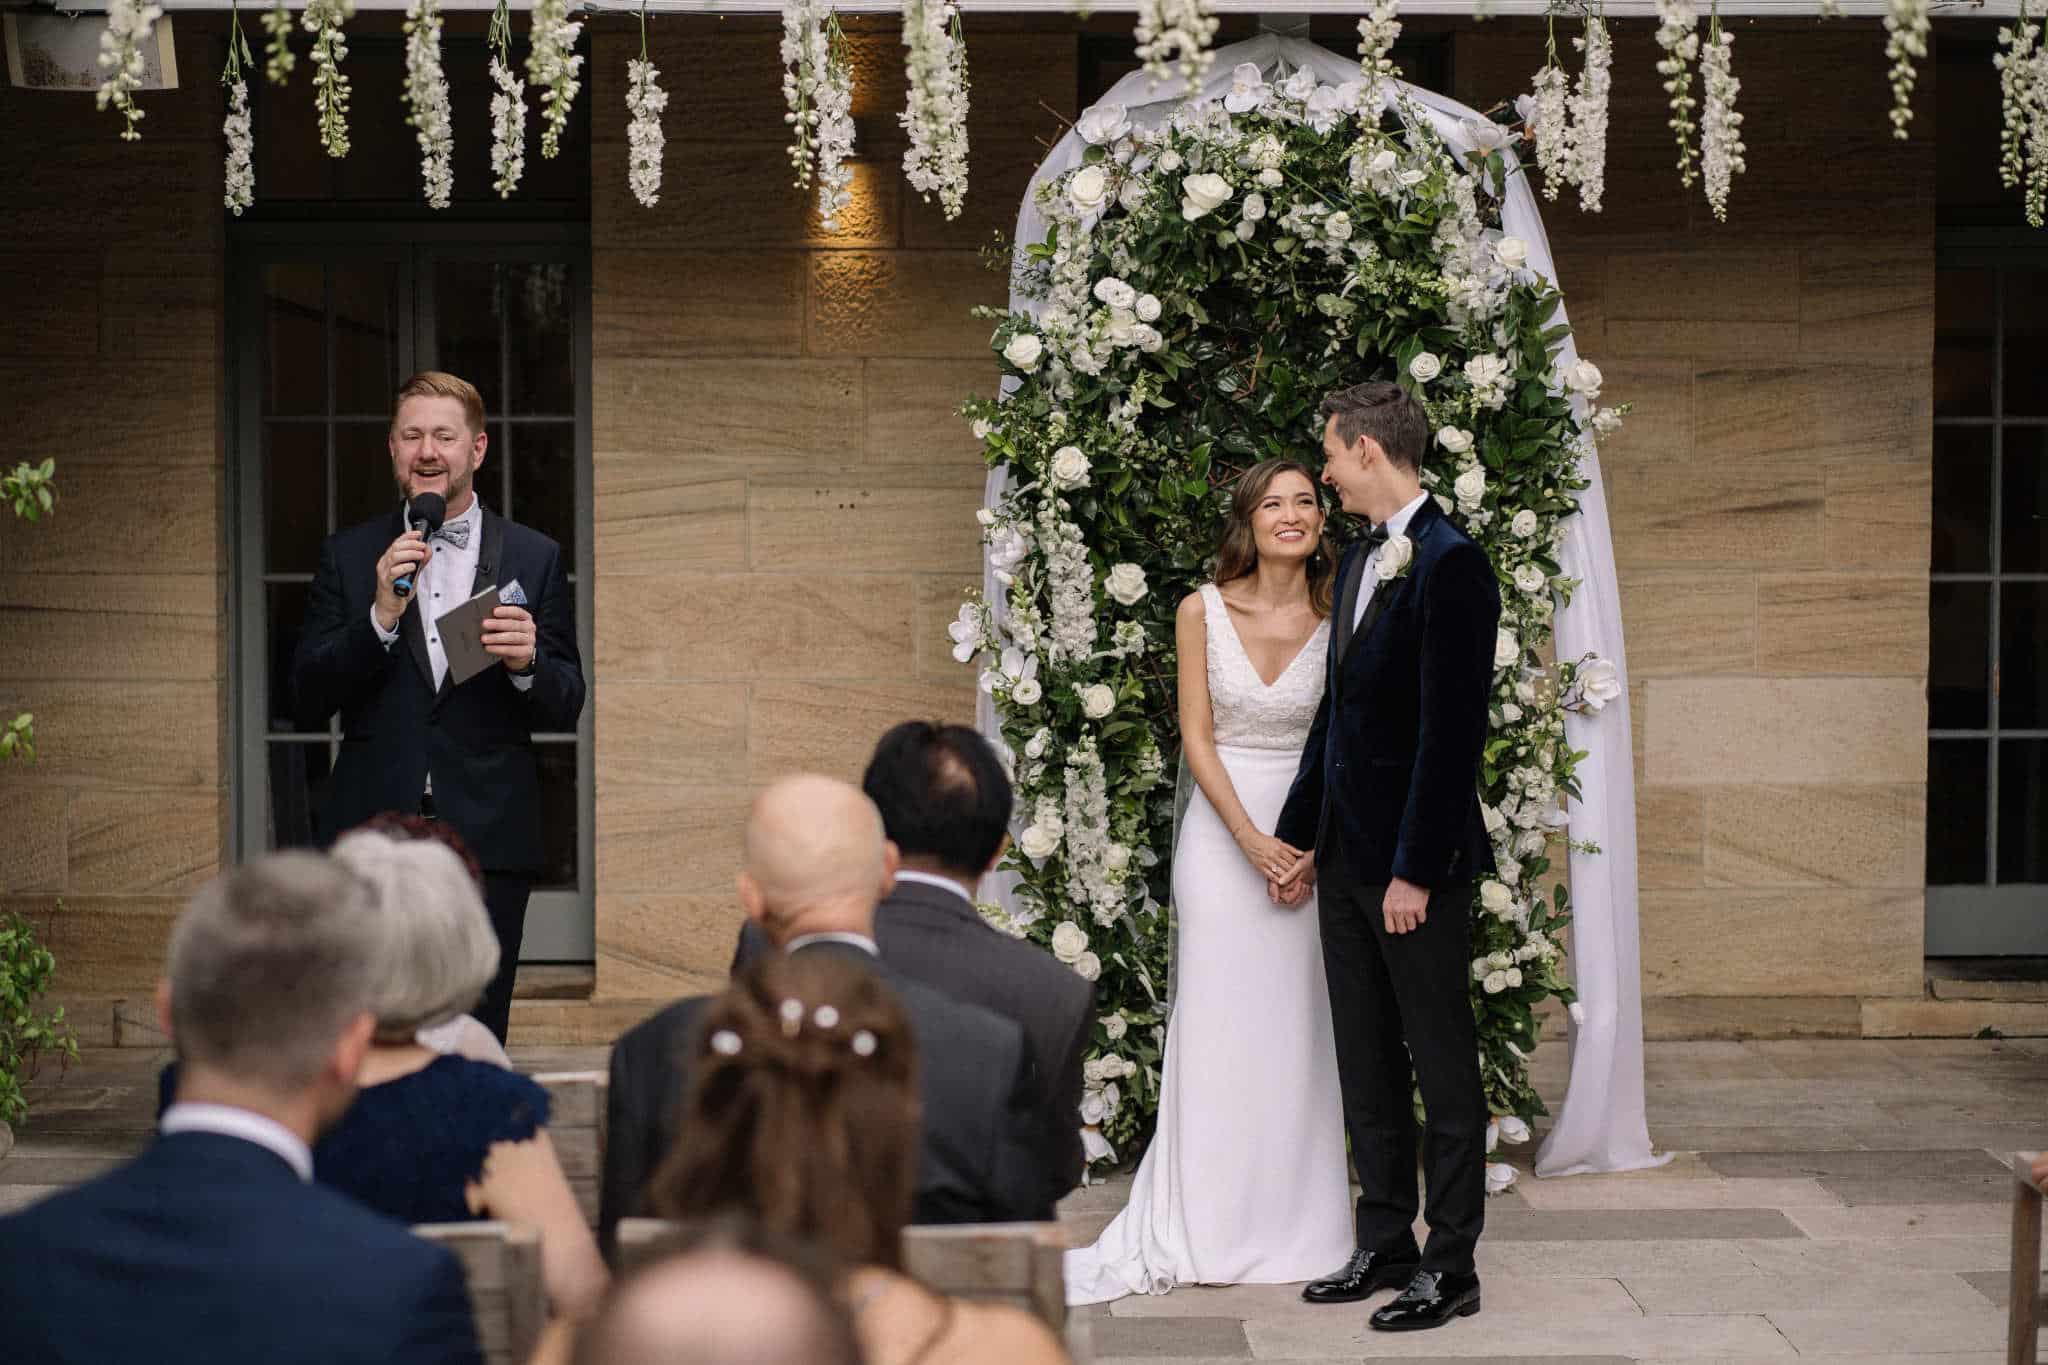 Gunners Barracks Wedding - Stephen Lee Marriage Celebrant Sydney Male